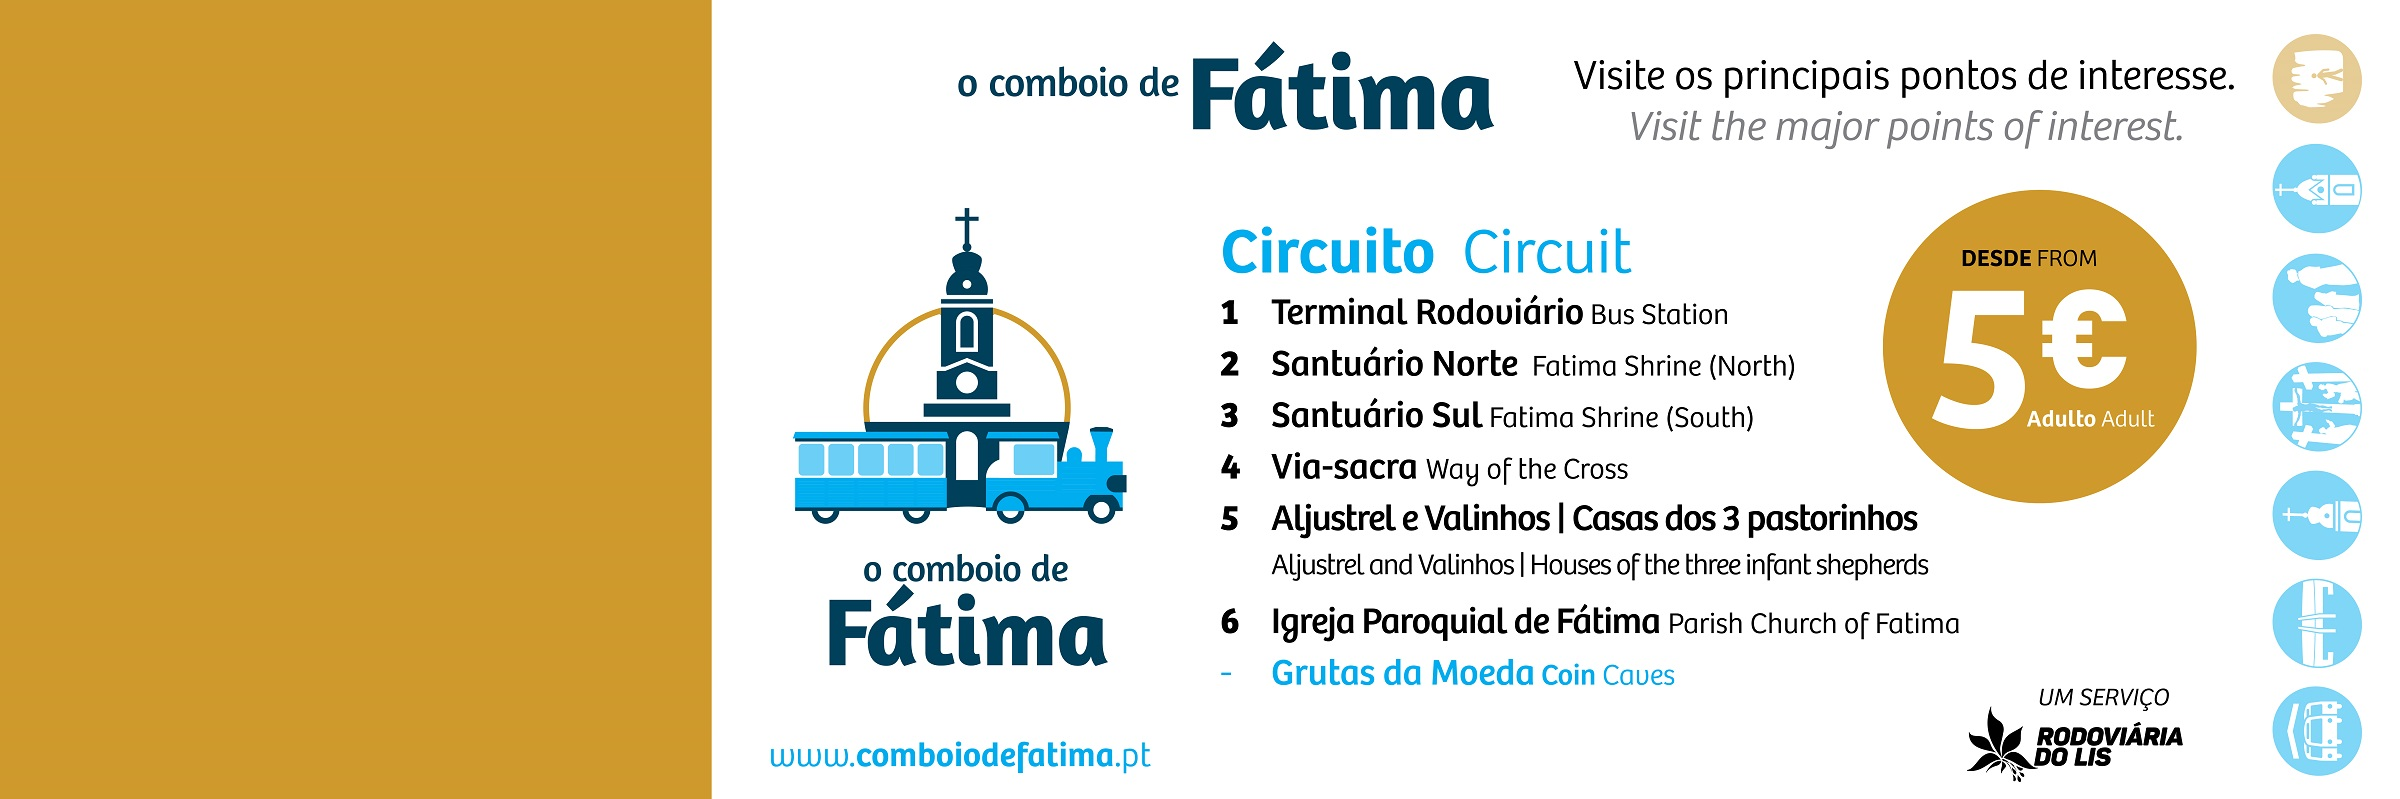 banner_comboiodefatima3